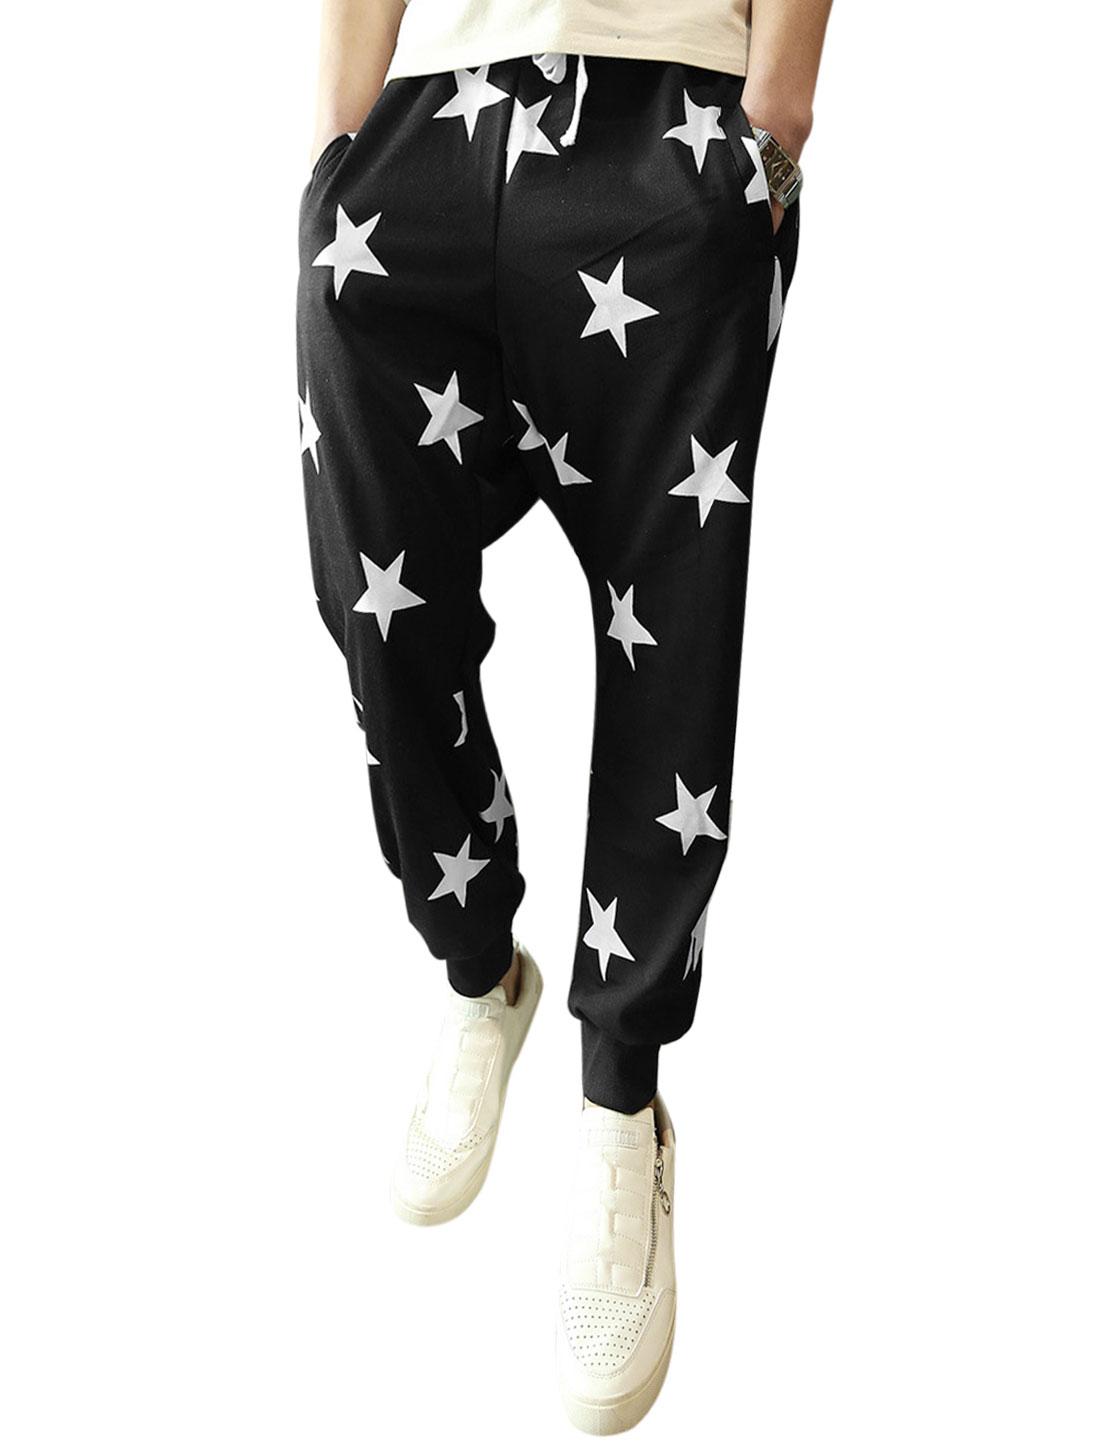 Men Stars Pattern Drawstring Waist Ribbed Cuffs Harem Pants Black W30